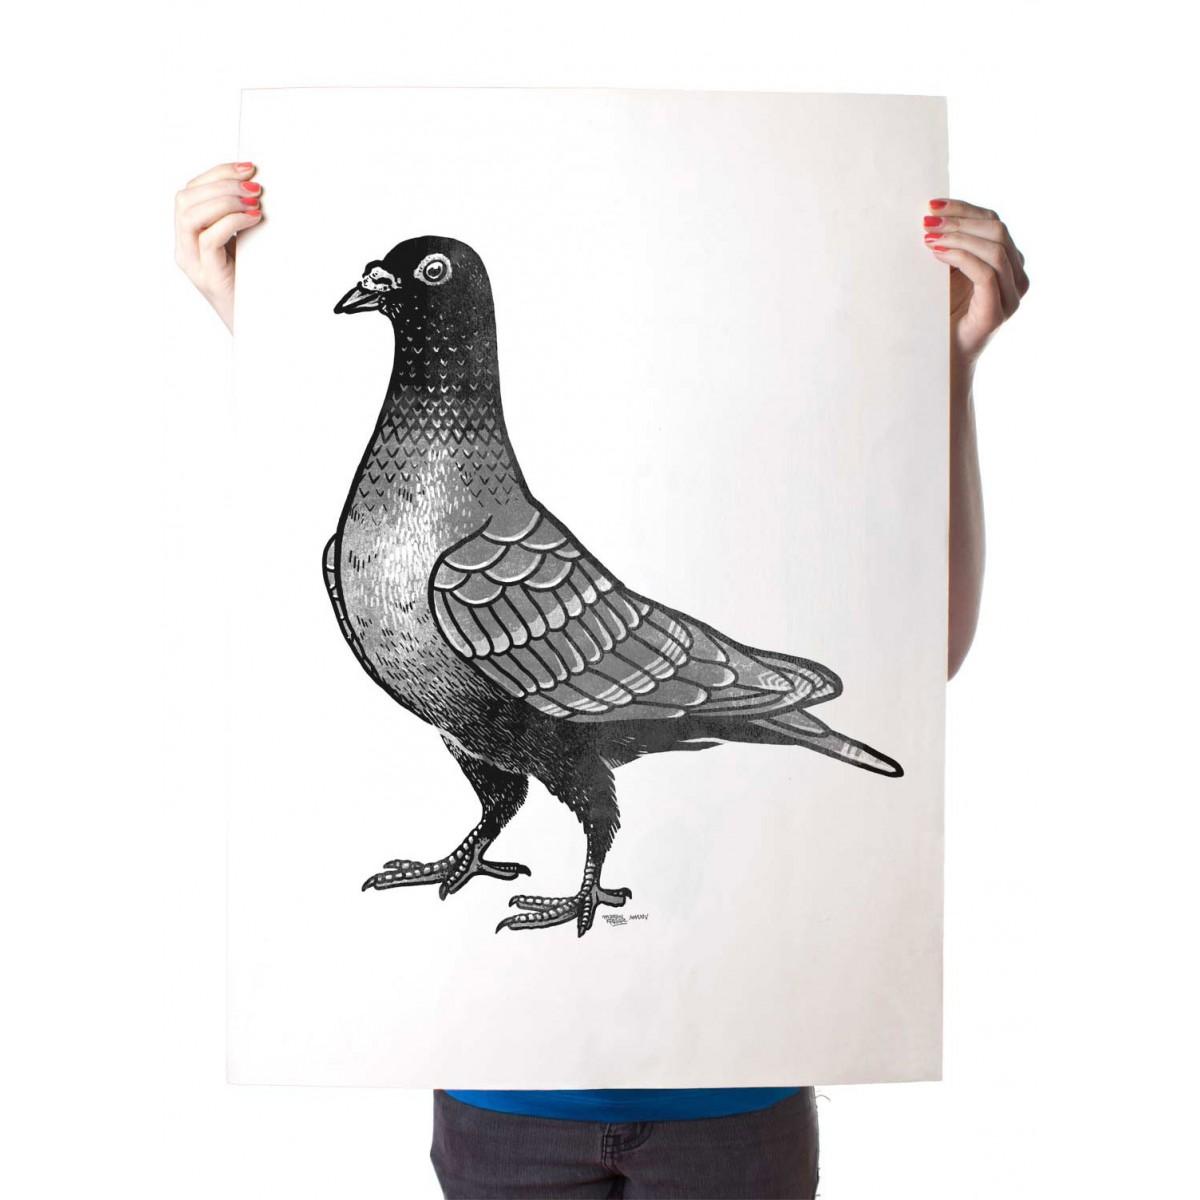 Martin Krusche – Poster »La Paloma« 50x70cm oder DINA3, Illustration